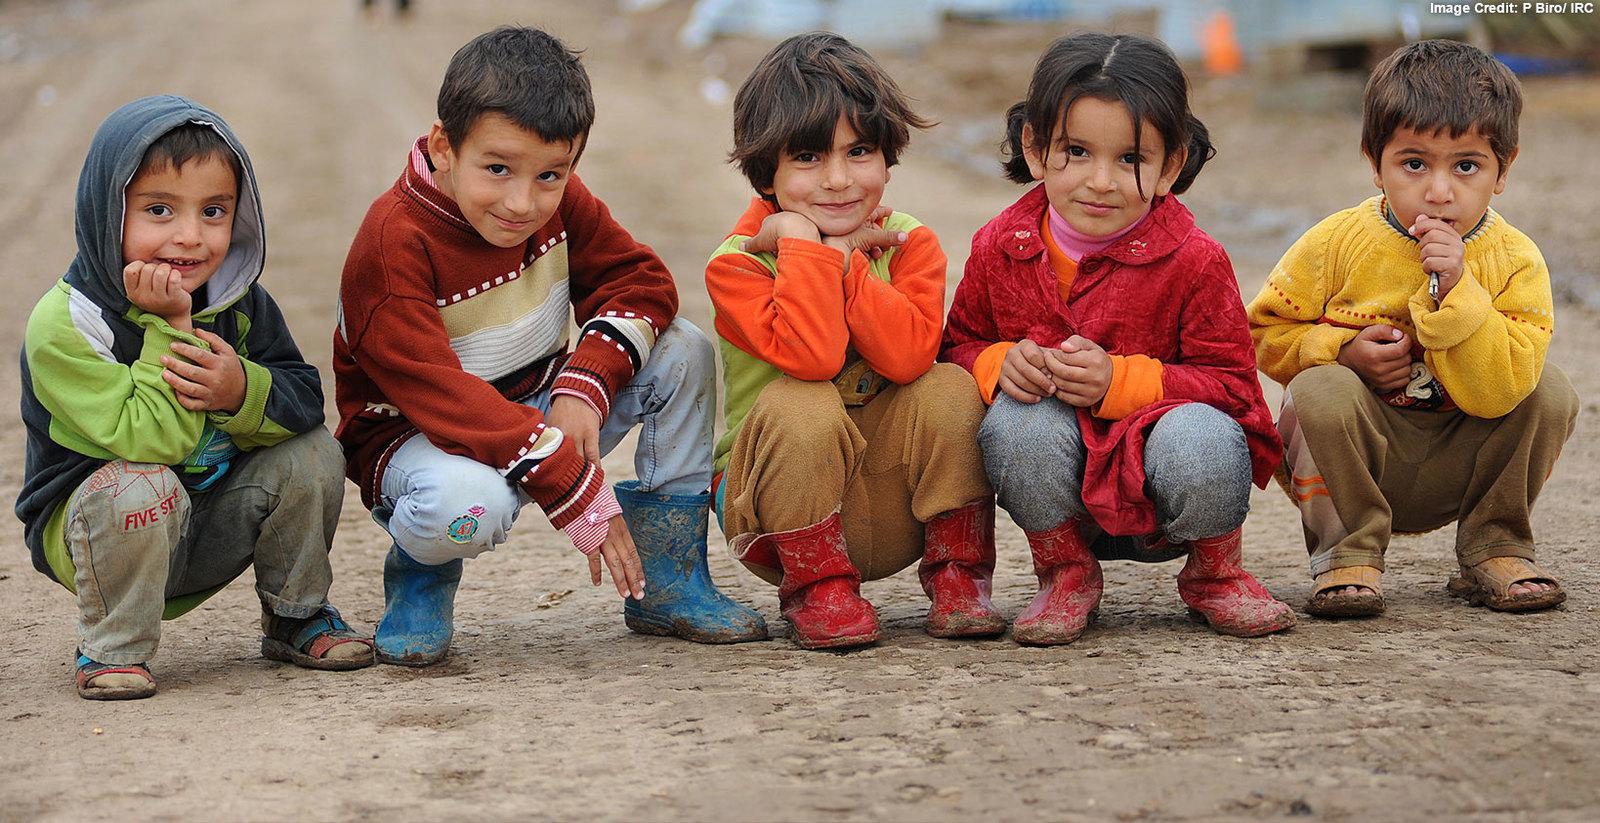 Empowering refugees-Egypt -reduce inequality